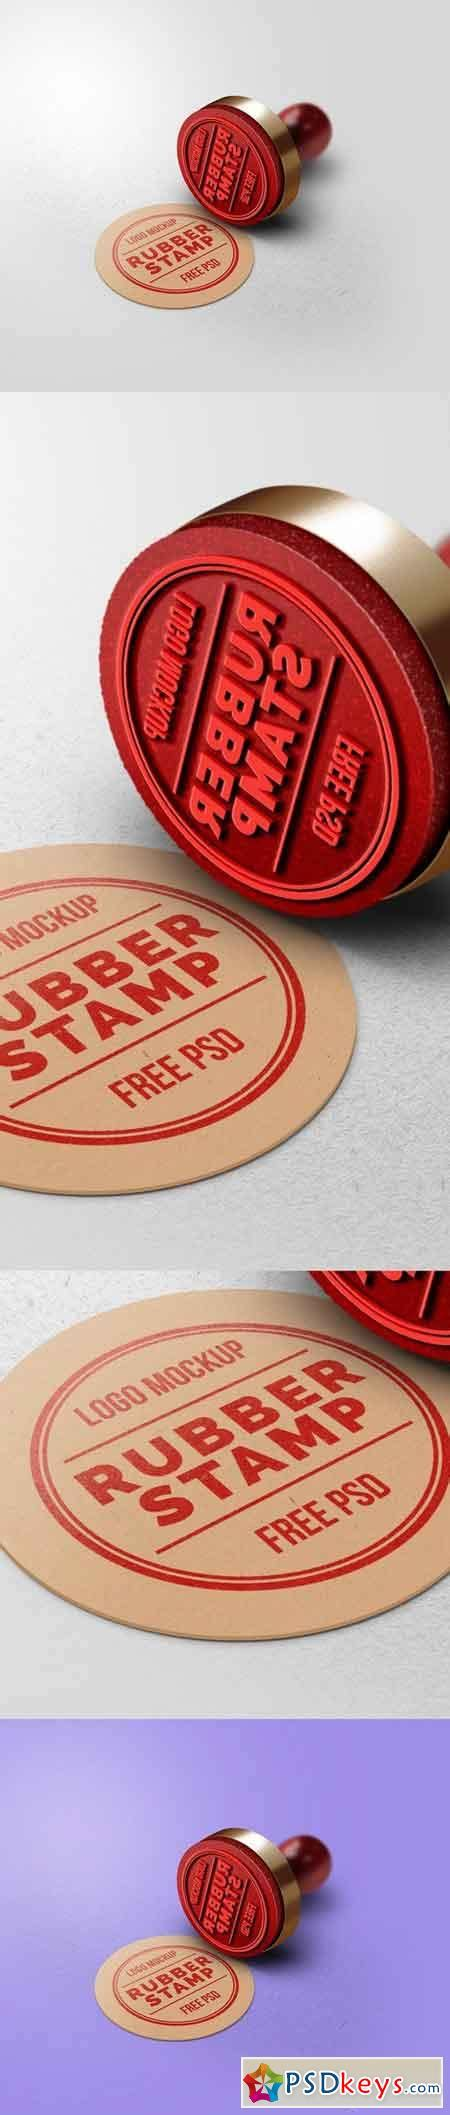 rubber stamp logo mockup   photoshop vector